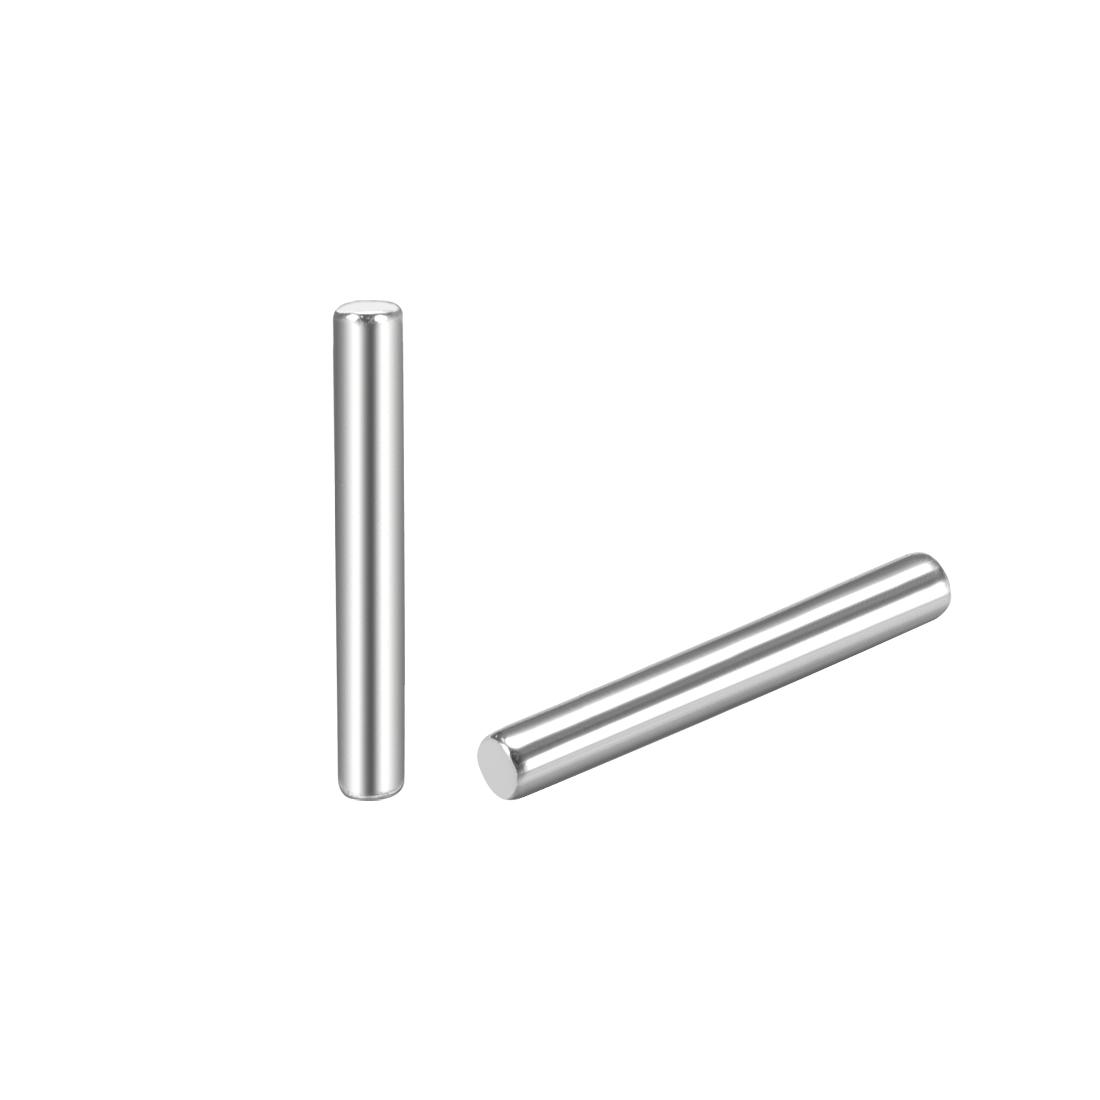 15Pcs 1.5mm x 12mm Dowel Pin 304 Stainless Steel Shelf Support Pin Fasten